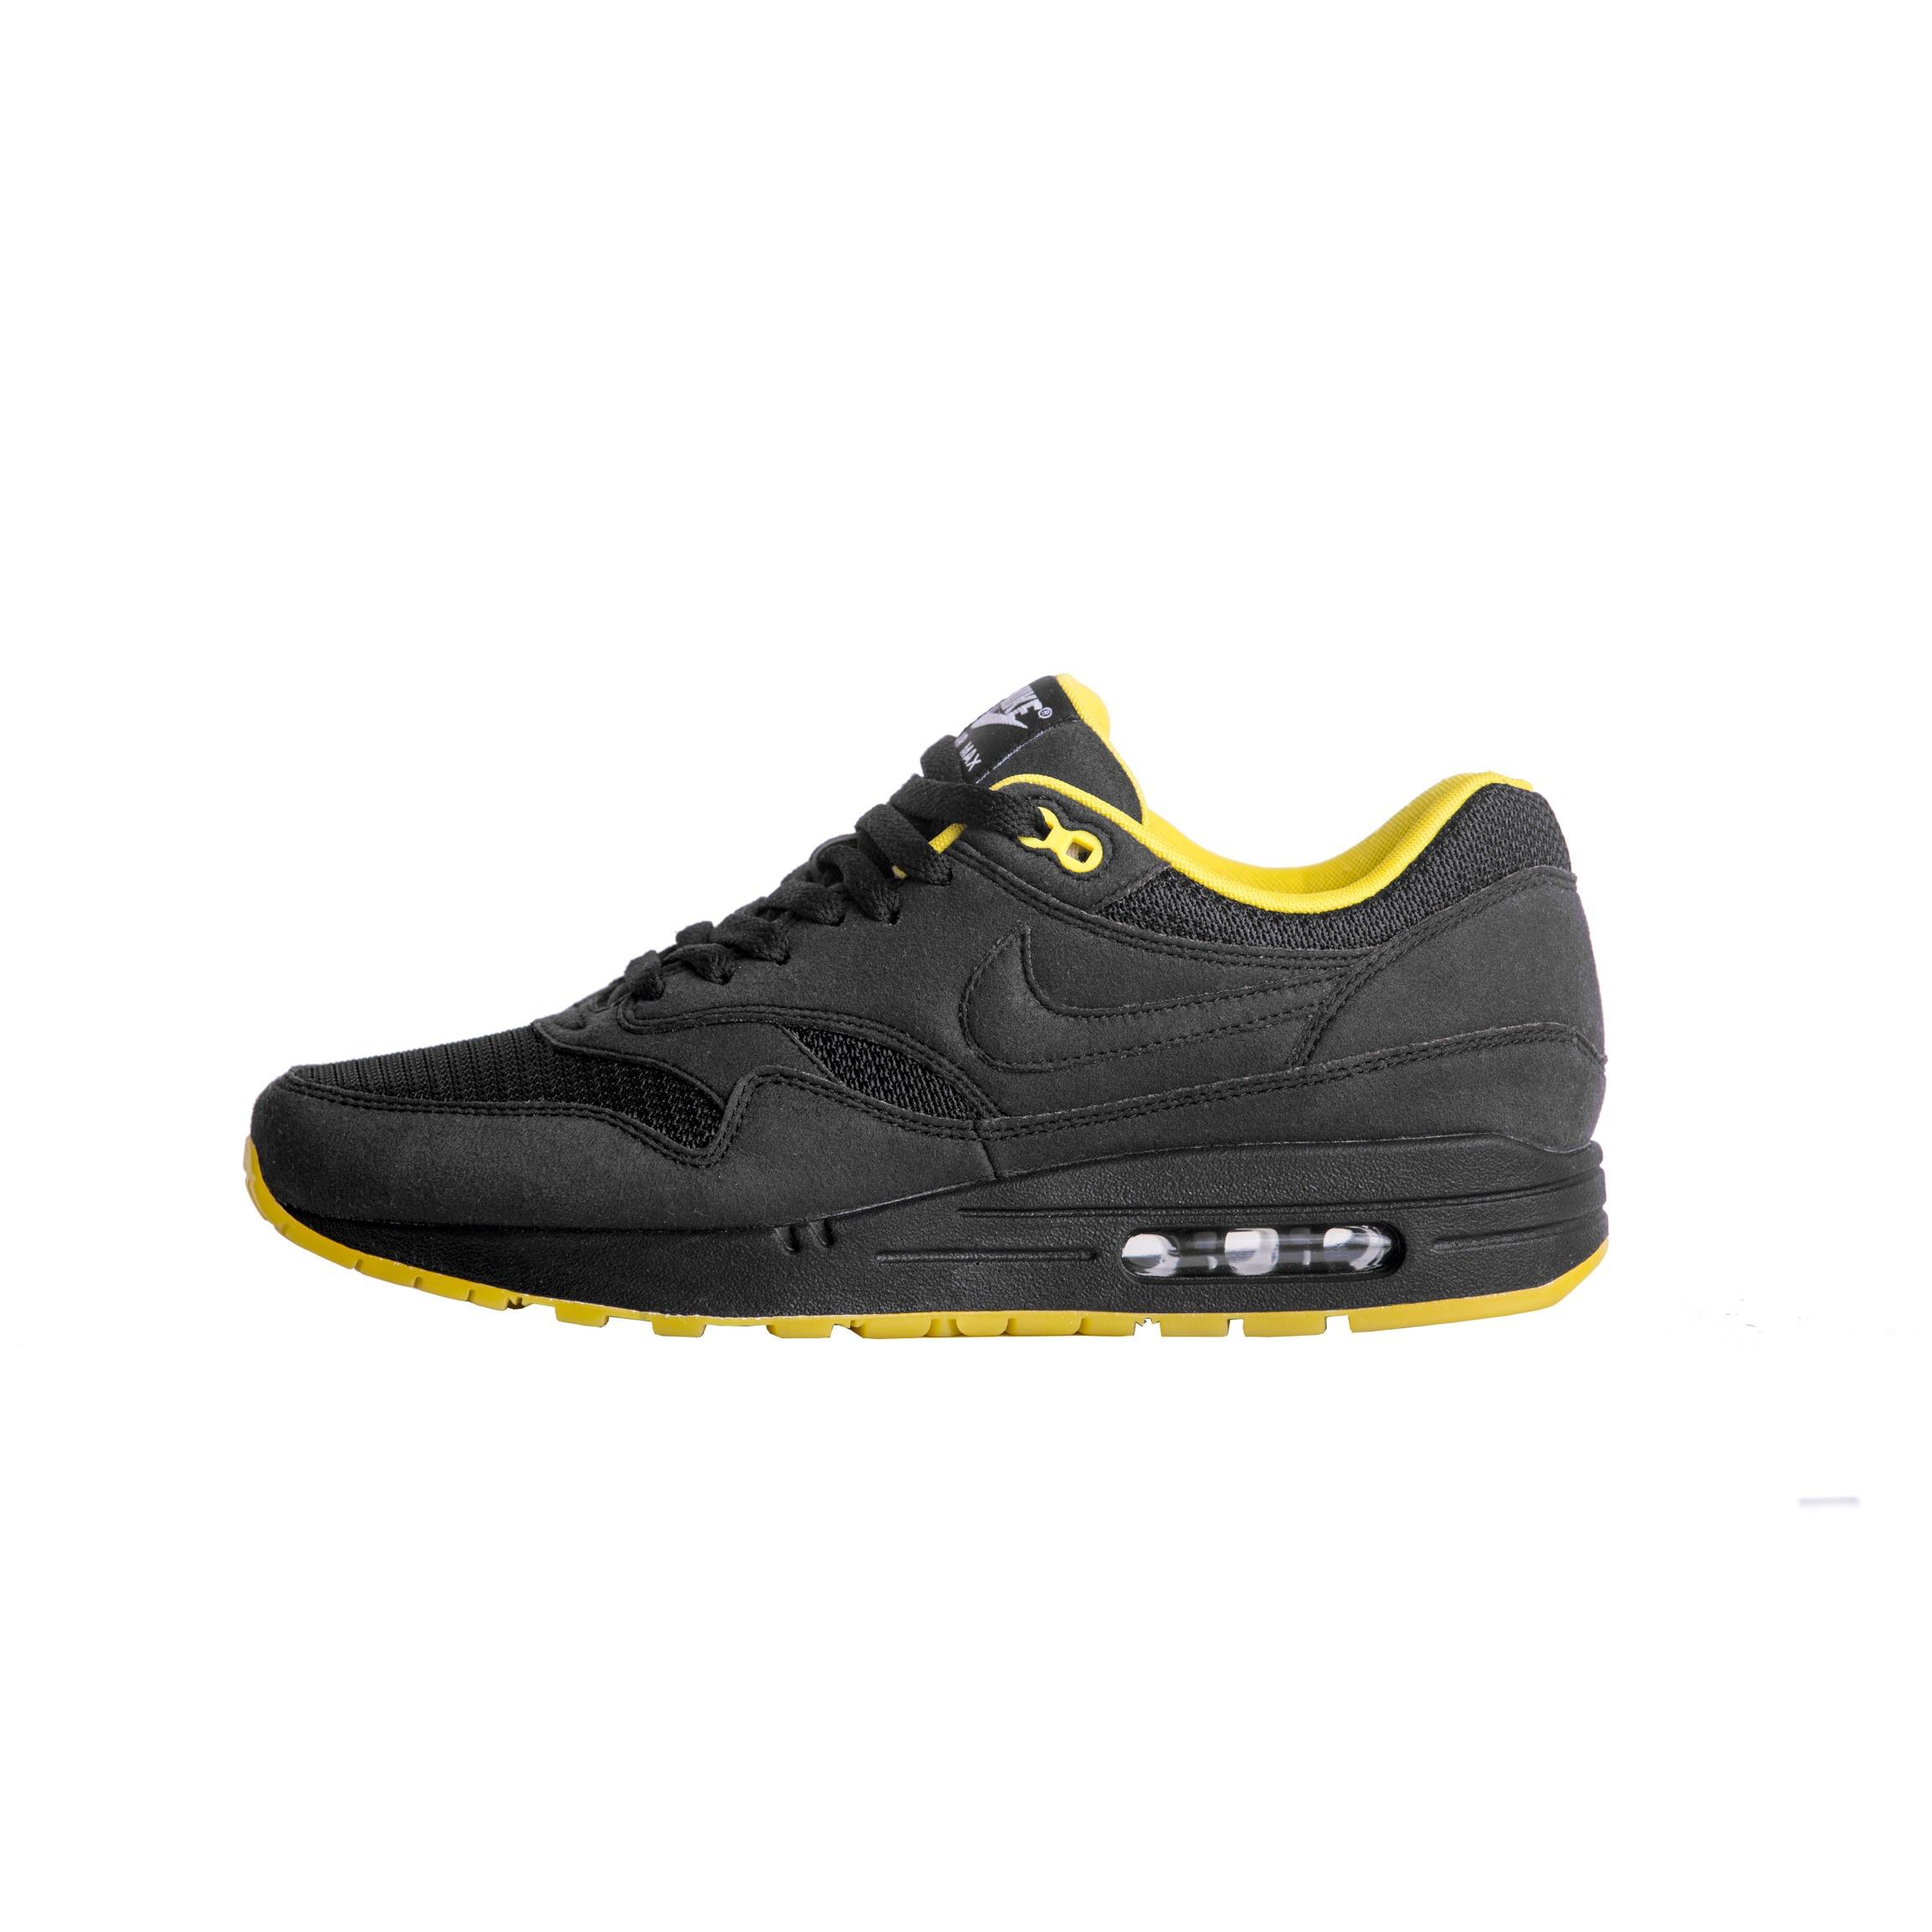 Nike Air Max 1 iD YAKSHA x QNS